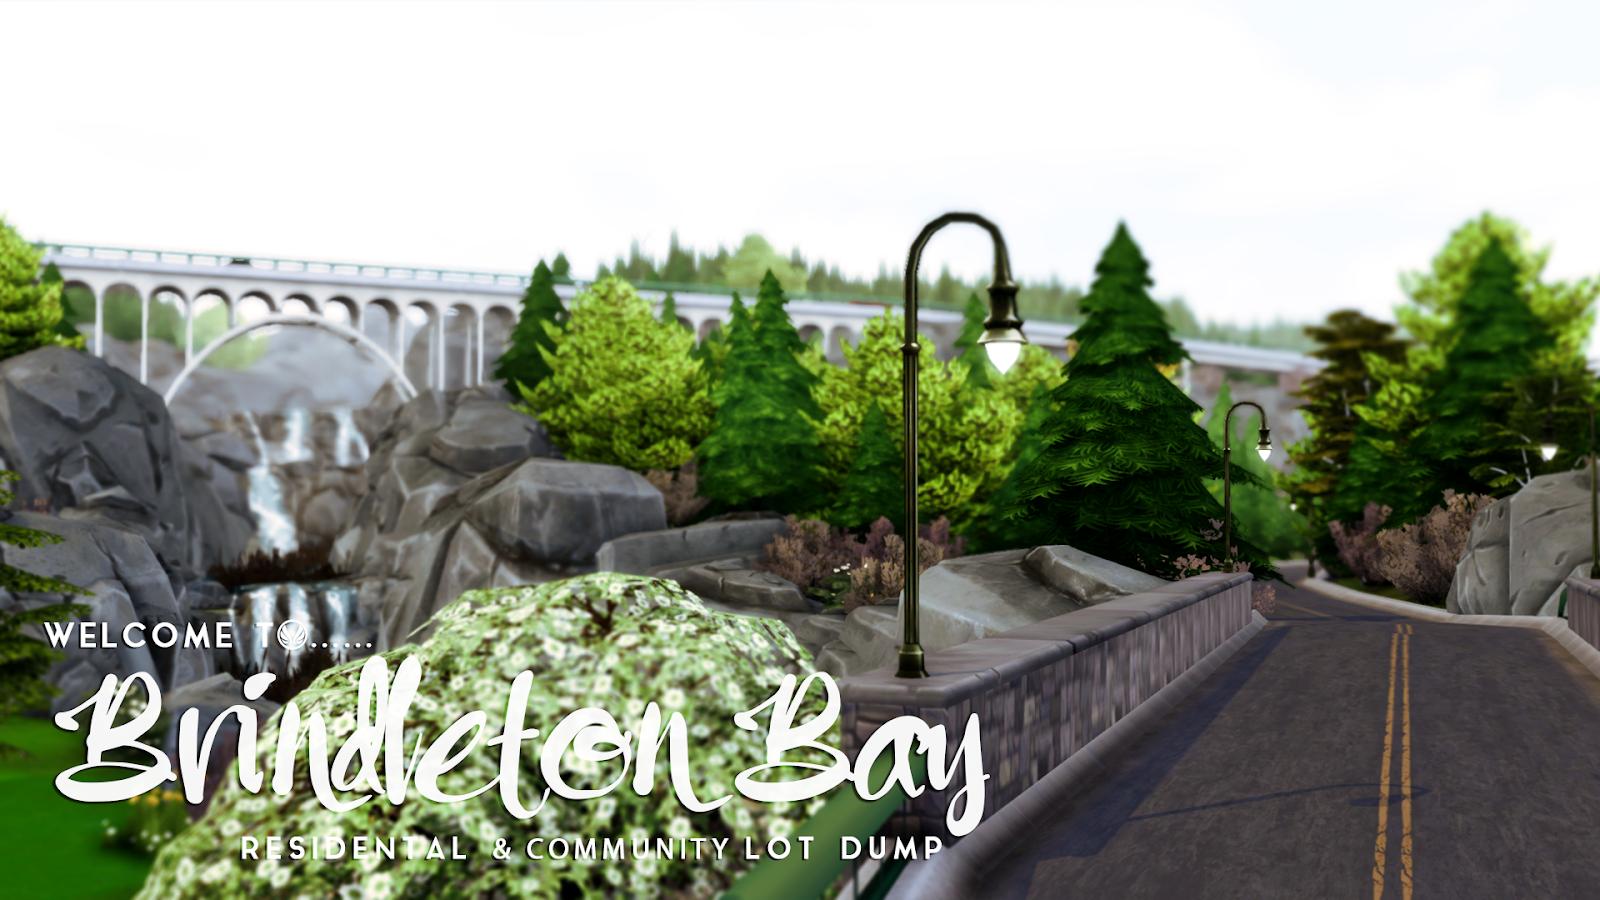 Simsational Designs: Welcome to Brindleton Bay - Community